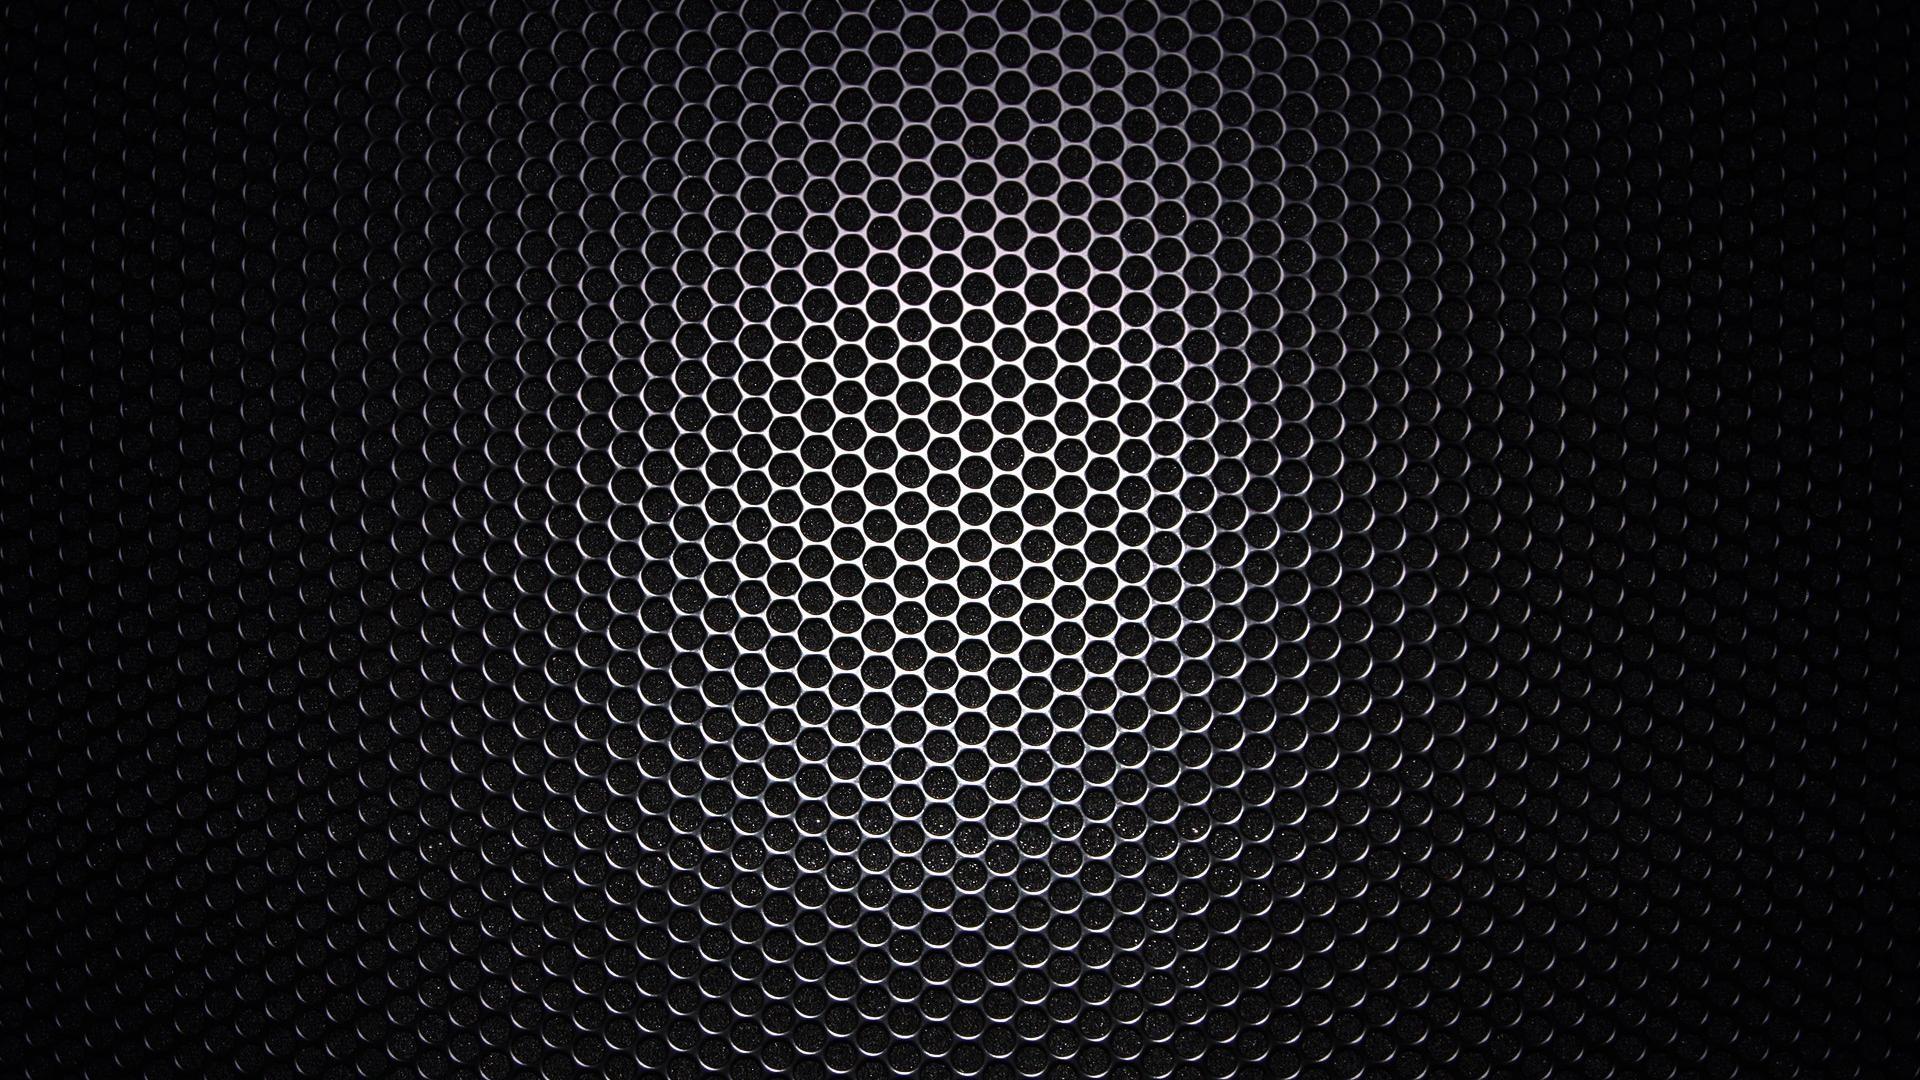 General 1920x1080 black texture gradient grid